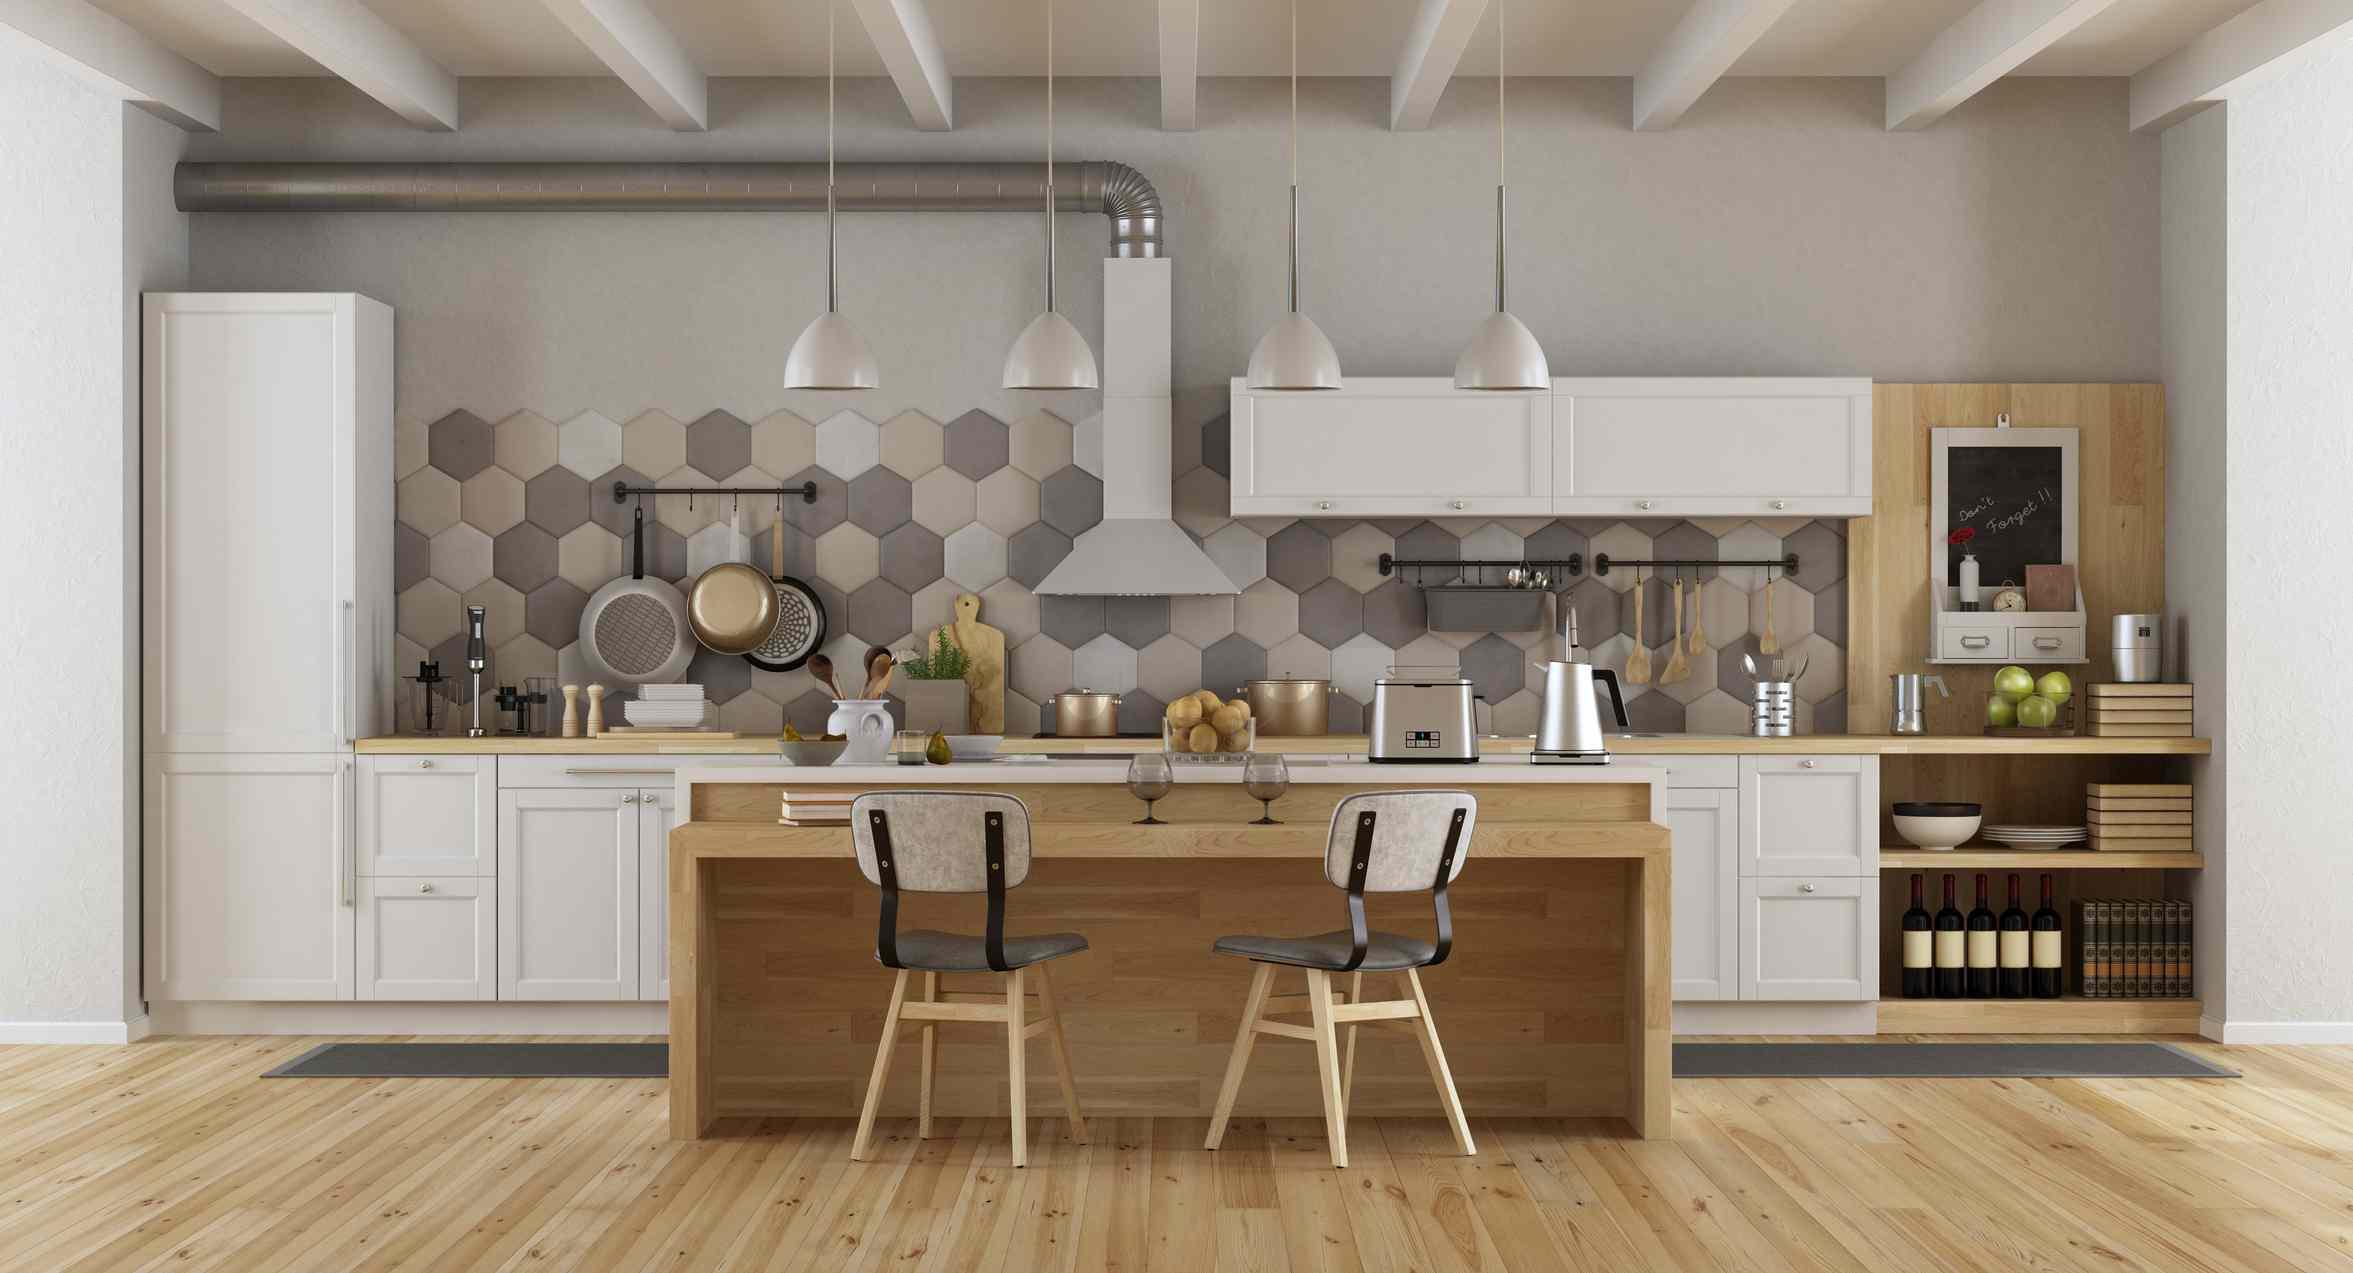 Hexagonal tile backsplash